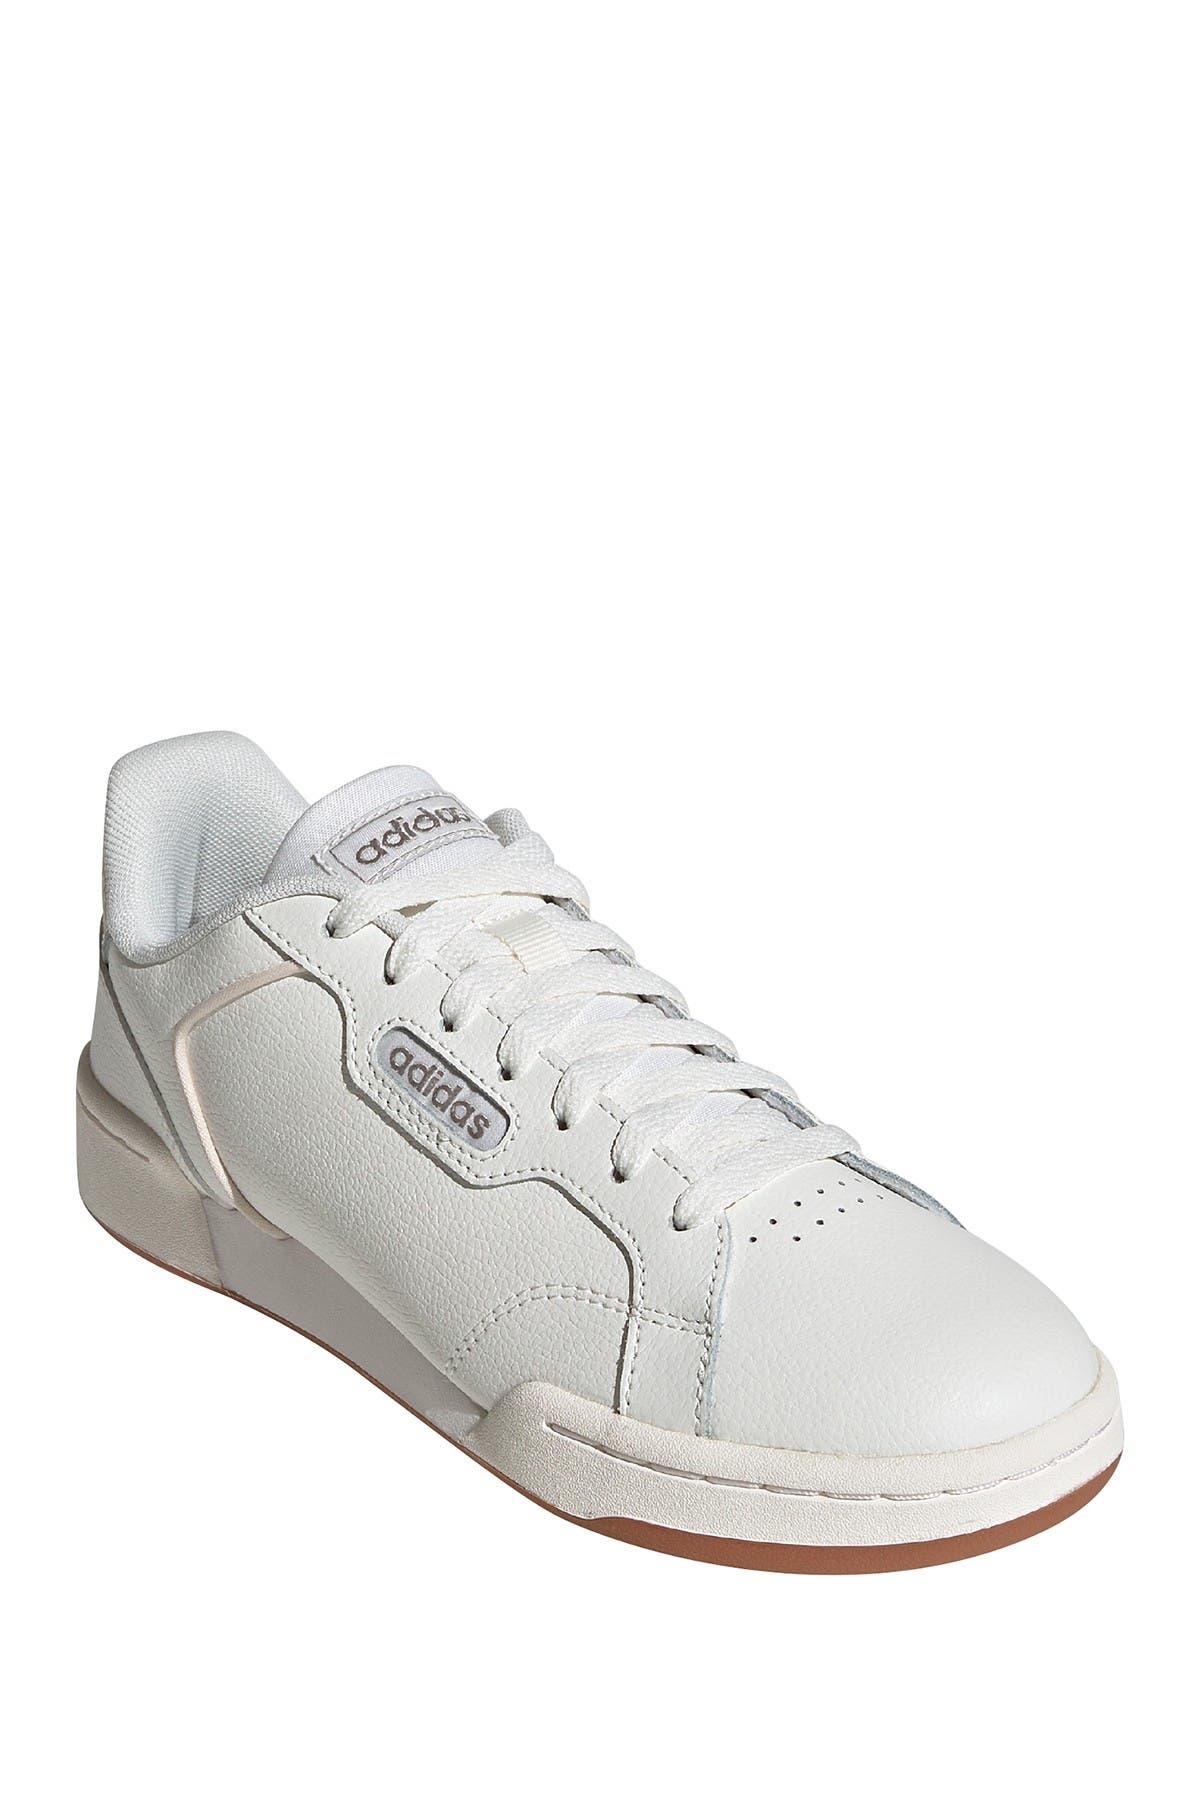 adidas | Roguera Sneaker | Nordstrom Rack